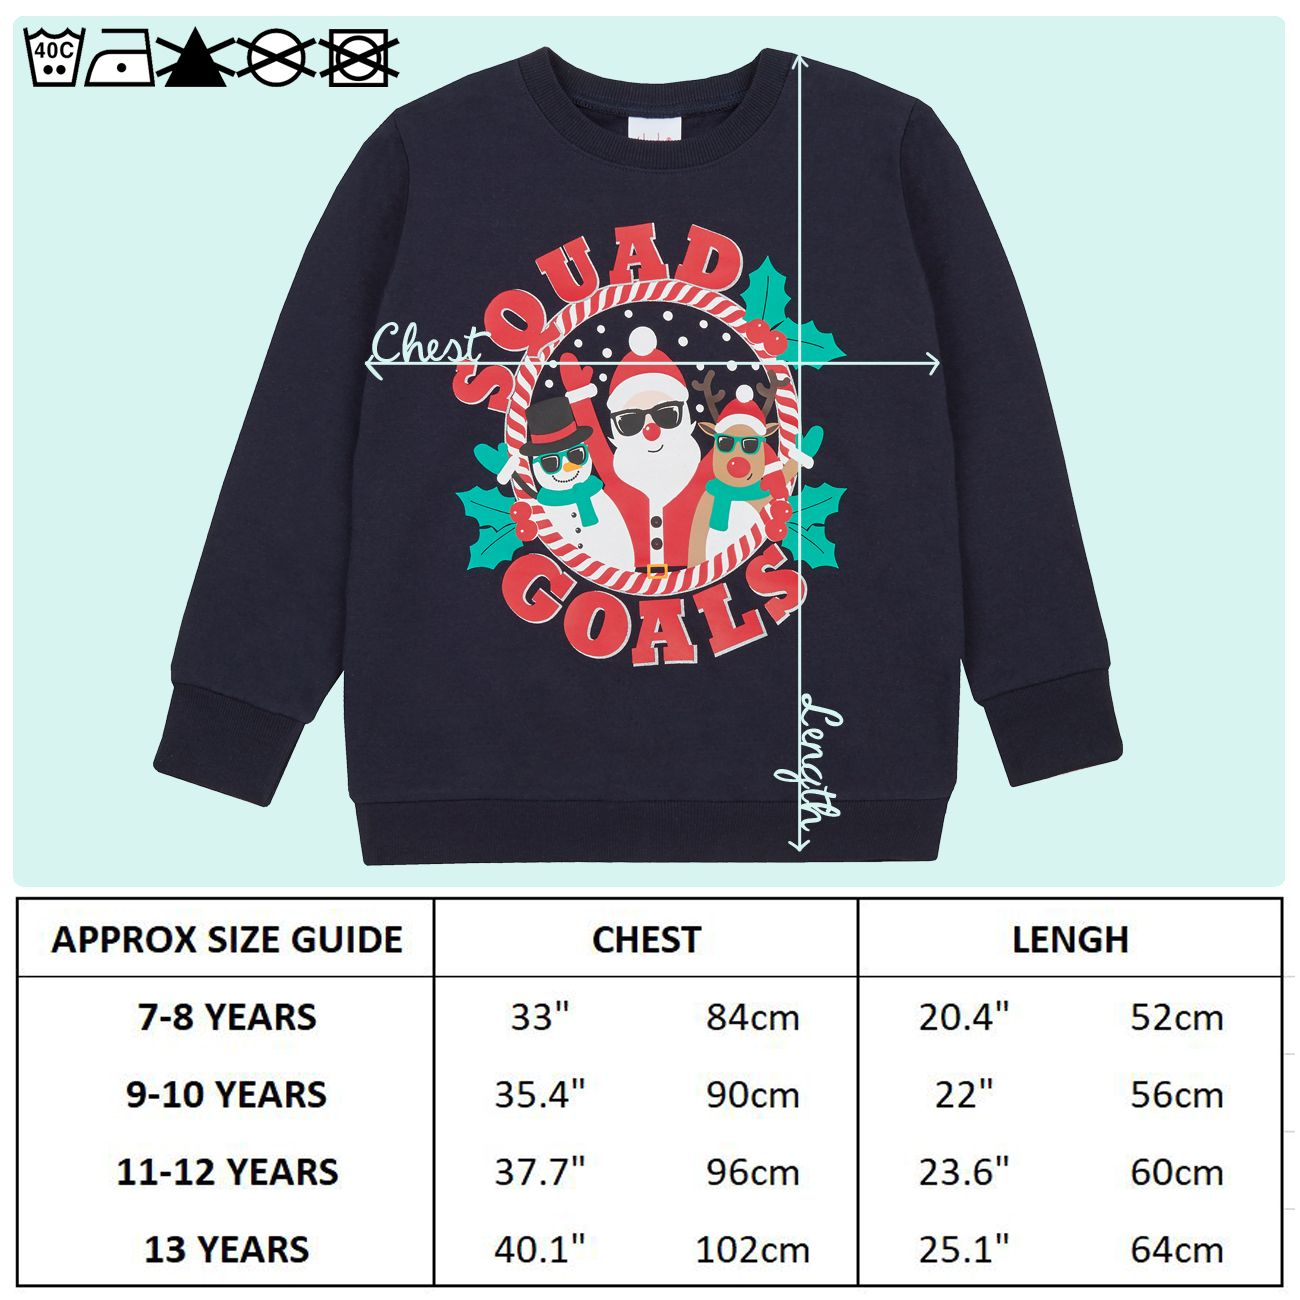 Enfants-Garcons-Filles-Noel-Noel-Pull-Sweat-shirt-Carlin-Glitter-chaud miniature 11